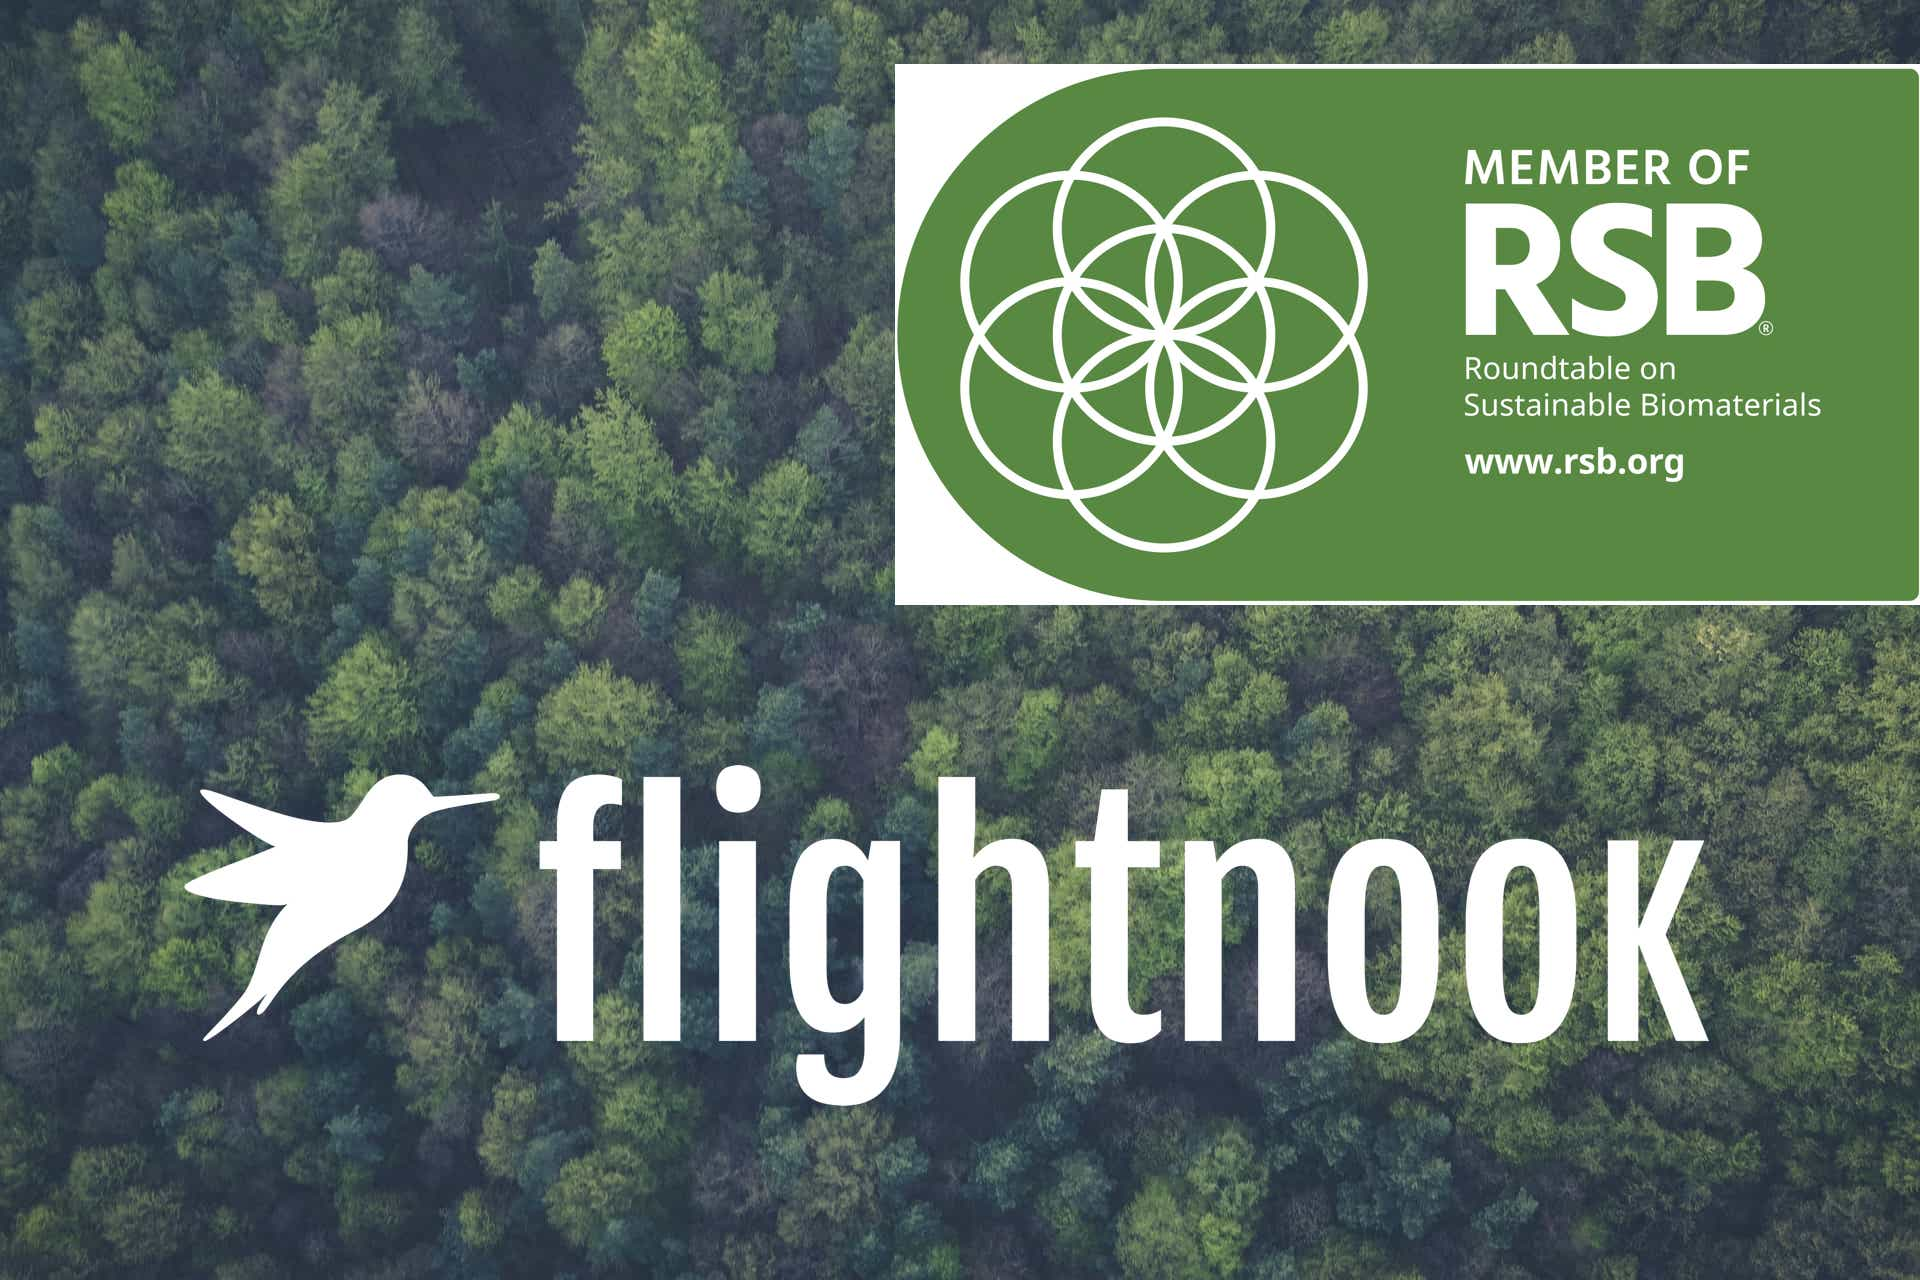 Flightnook membership RSB